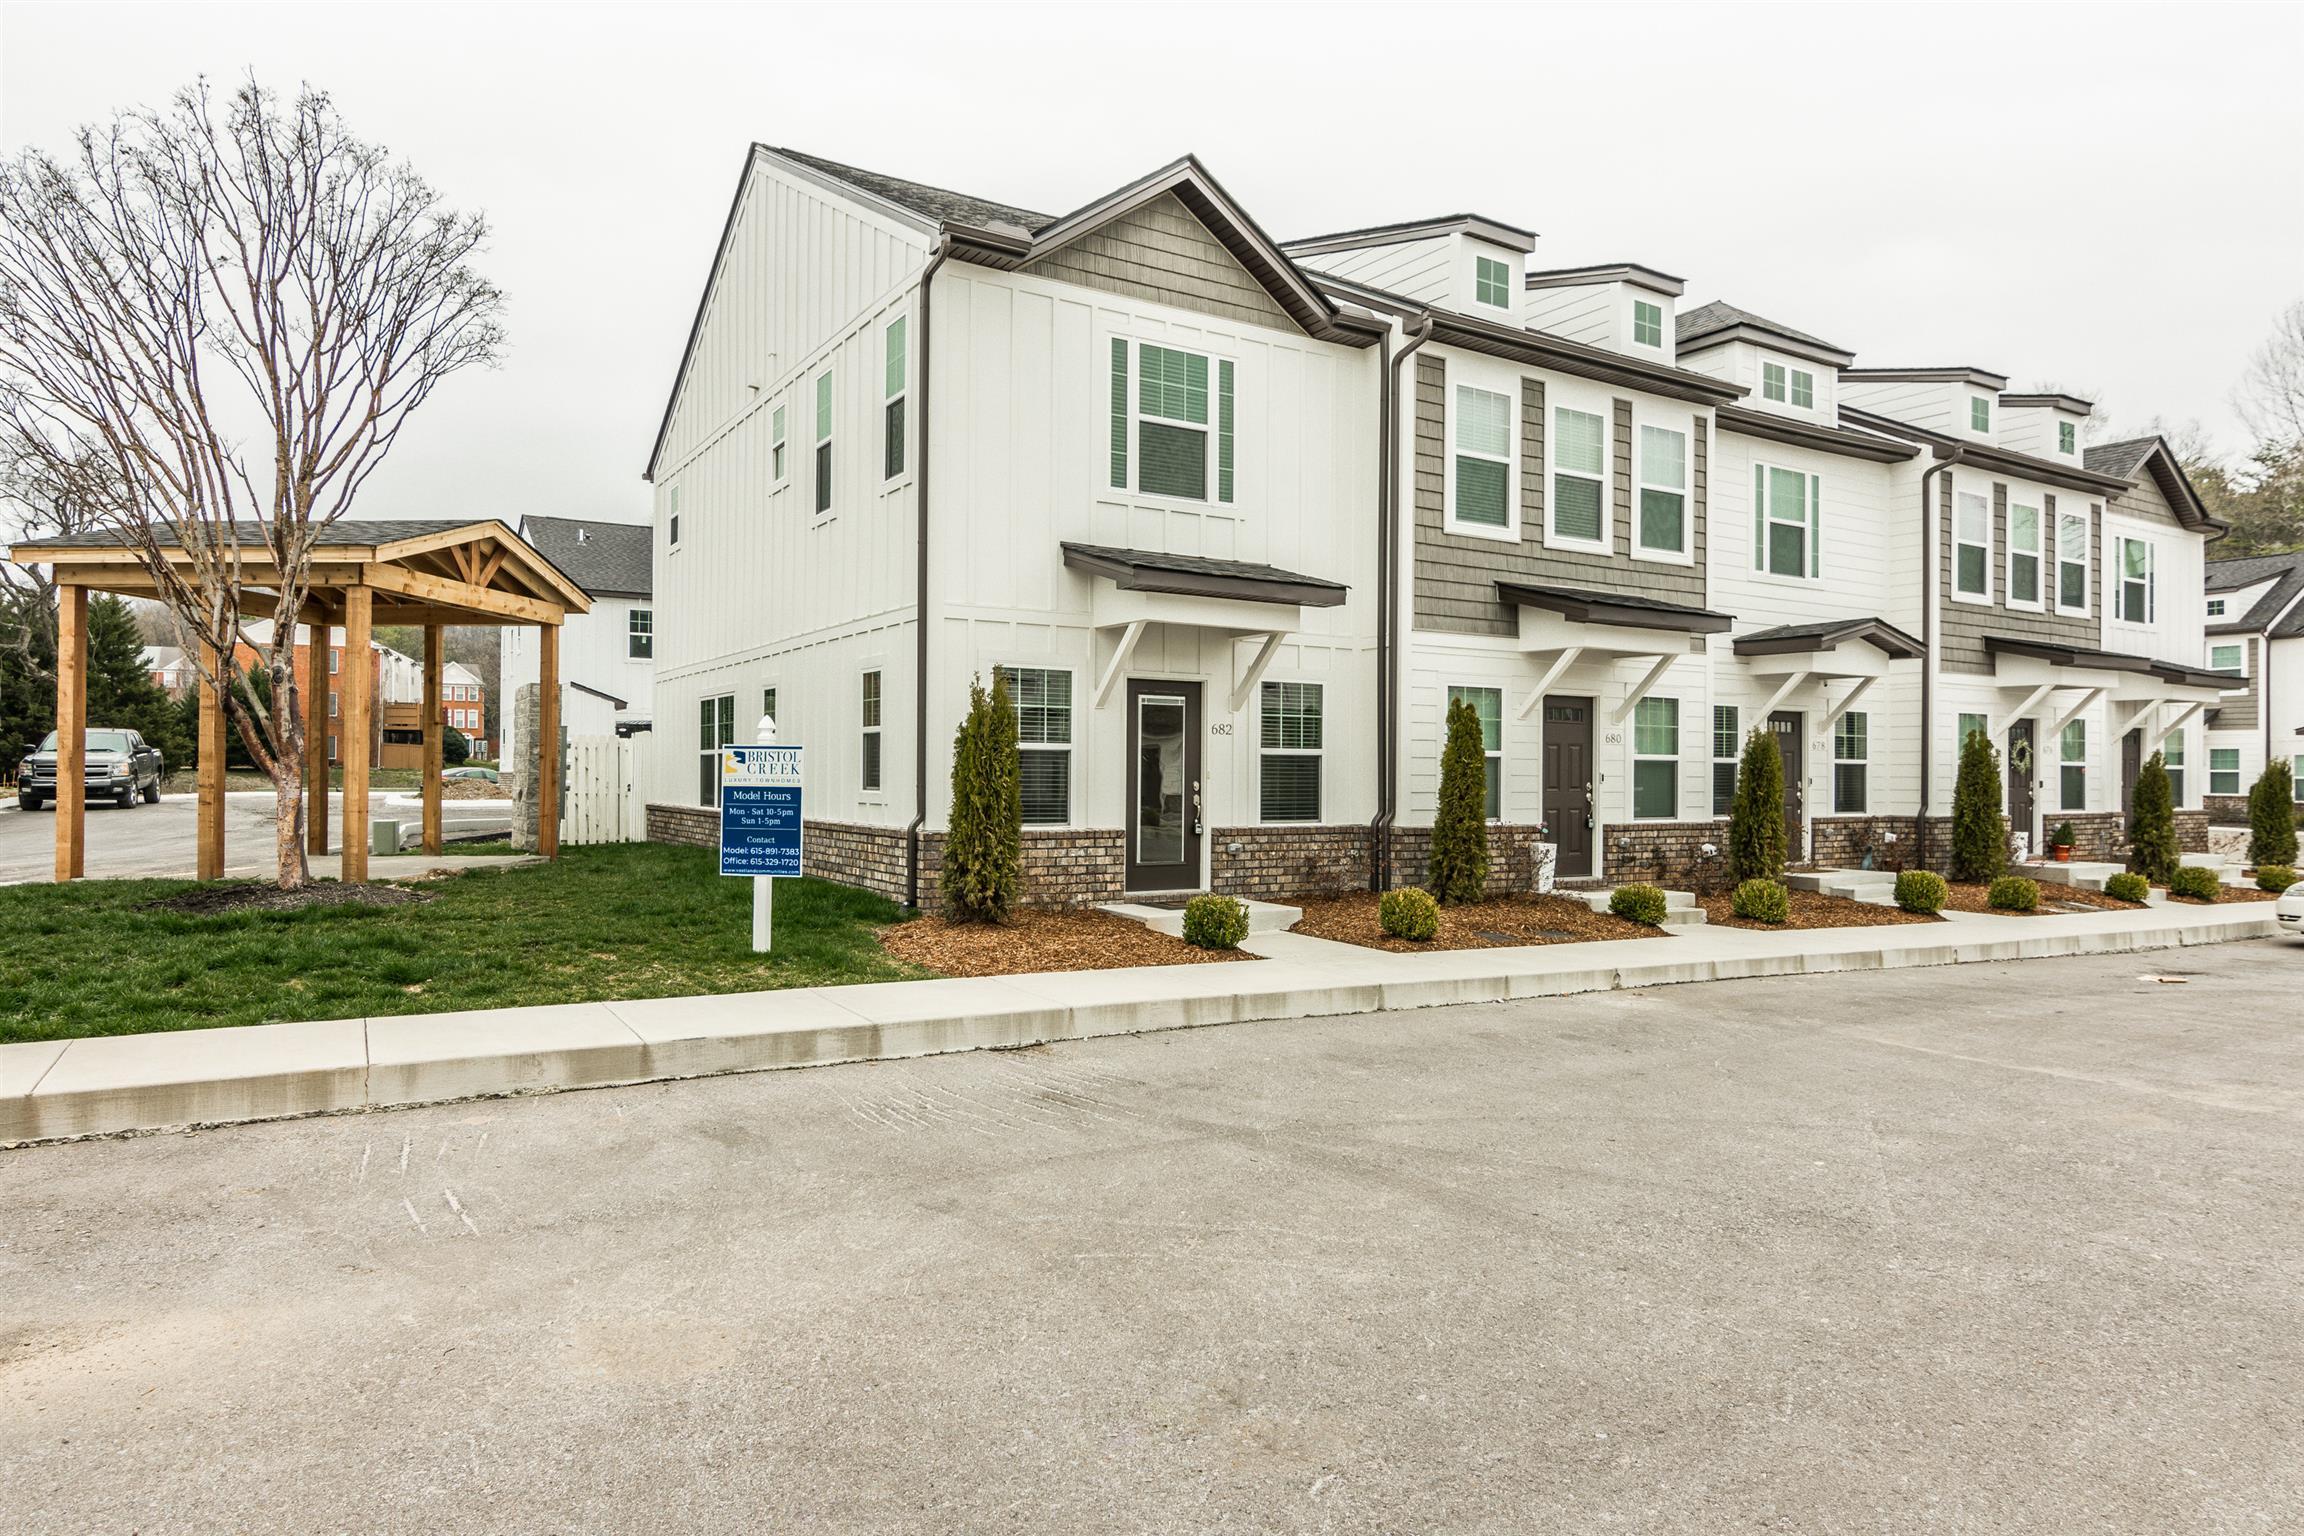 624 Bristol Creek Dr, Bellevue in Davidson County County, TN 37221 Home for Sale